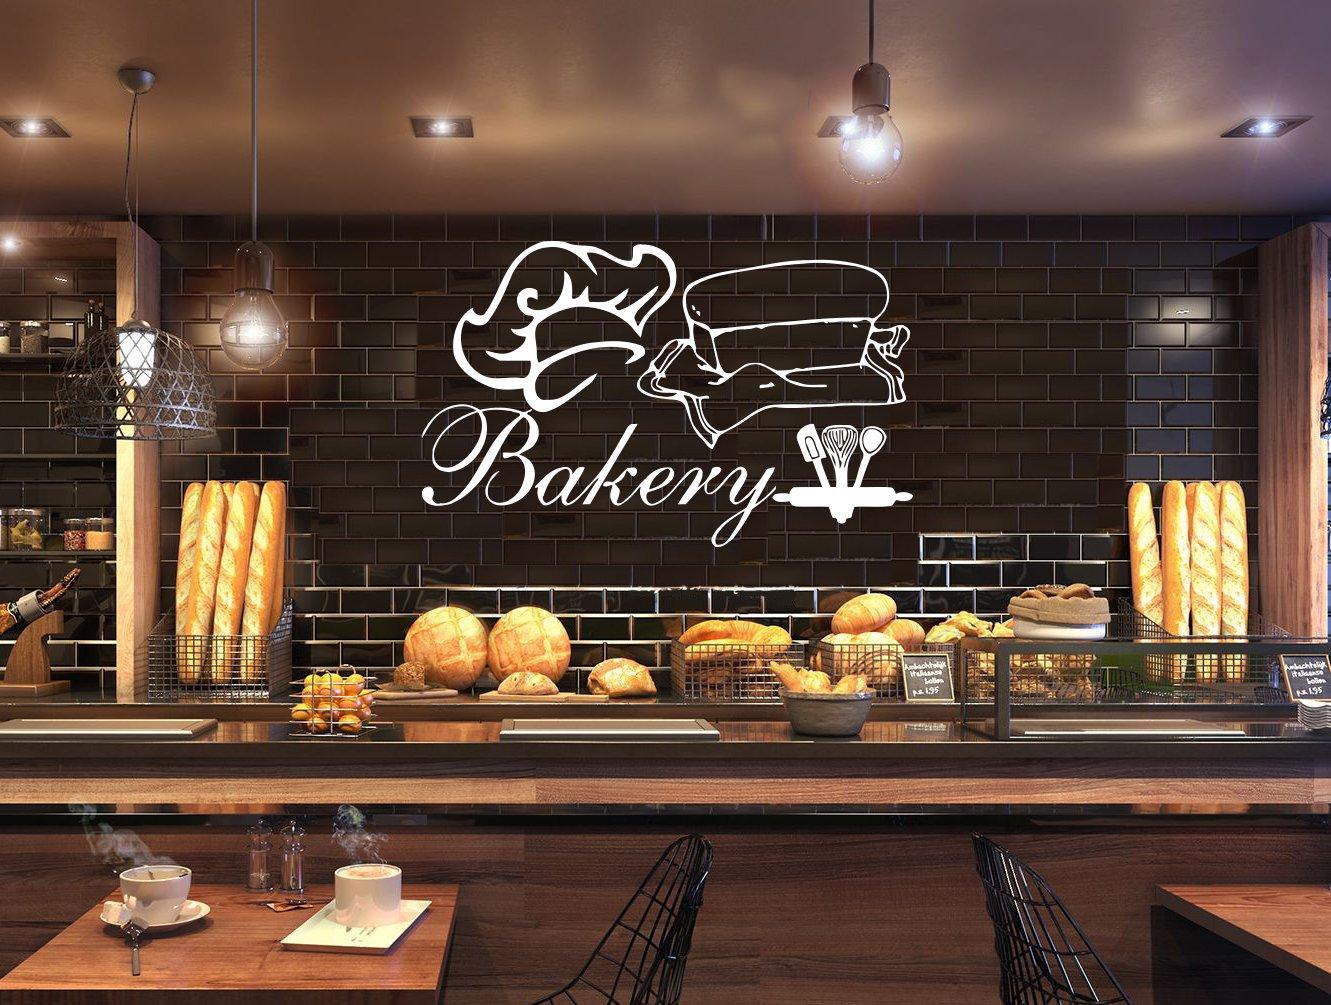 Amazon.com: Bakery Shop Logo Write your bakery name Bakeshop ...